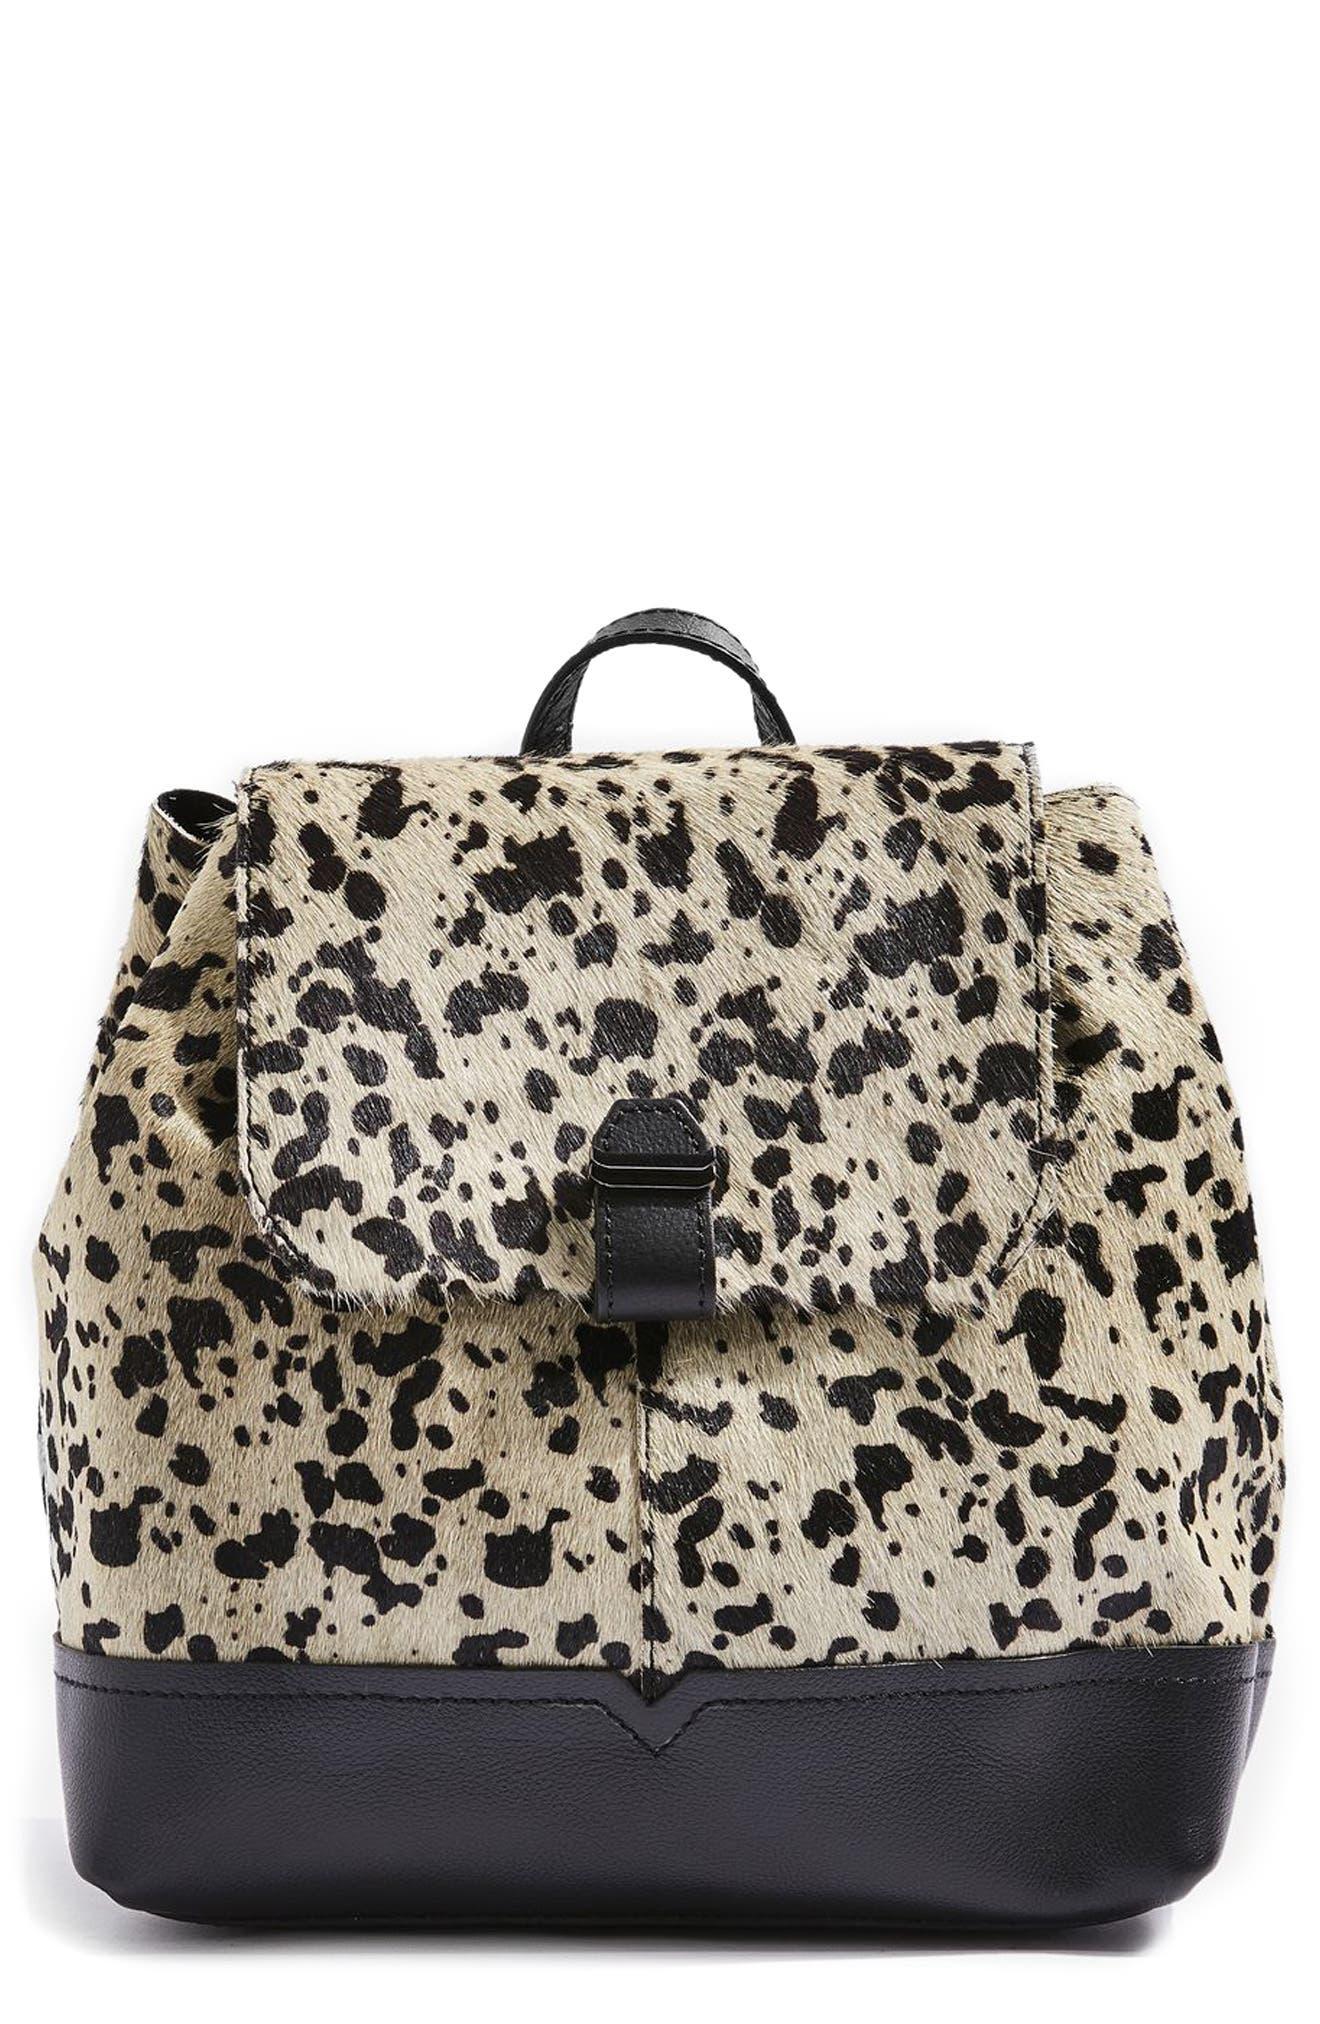 Topshop Genuine Calf Hair & Calfskin Leather Backpack